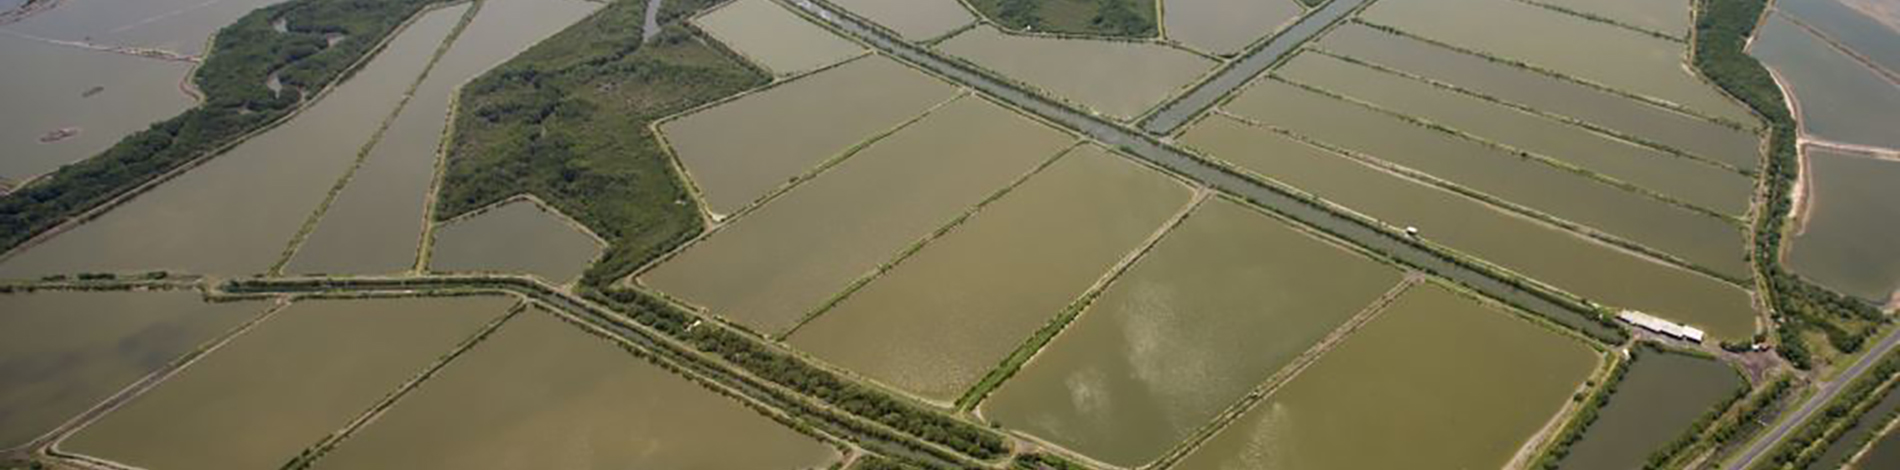 Vista aérea de la Finca La Apintal